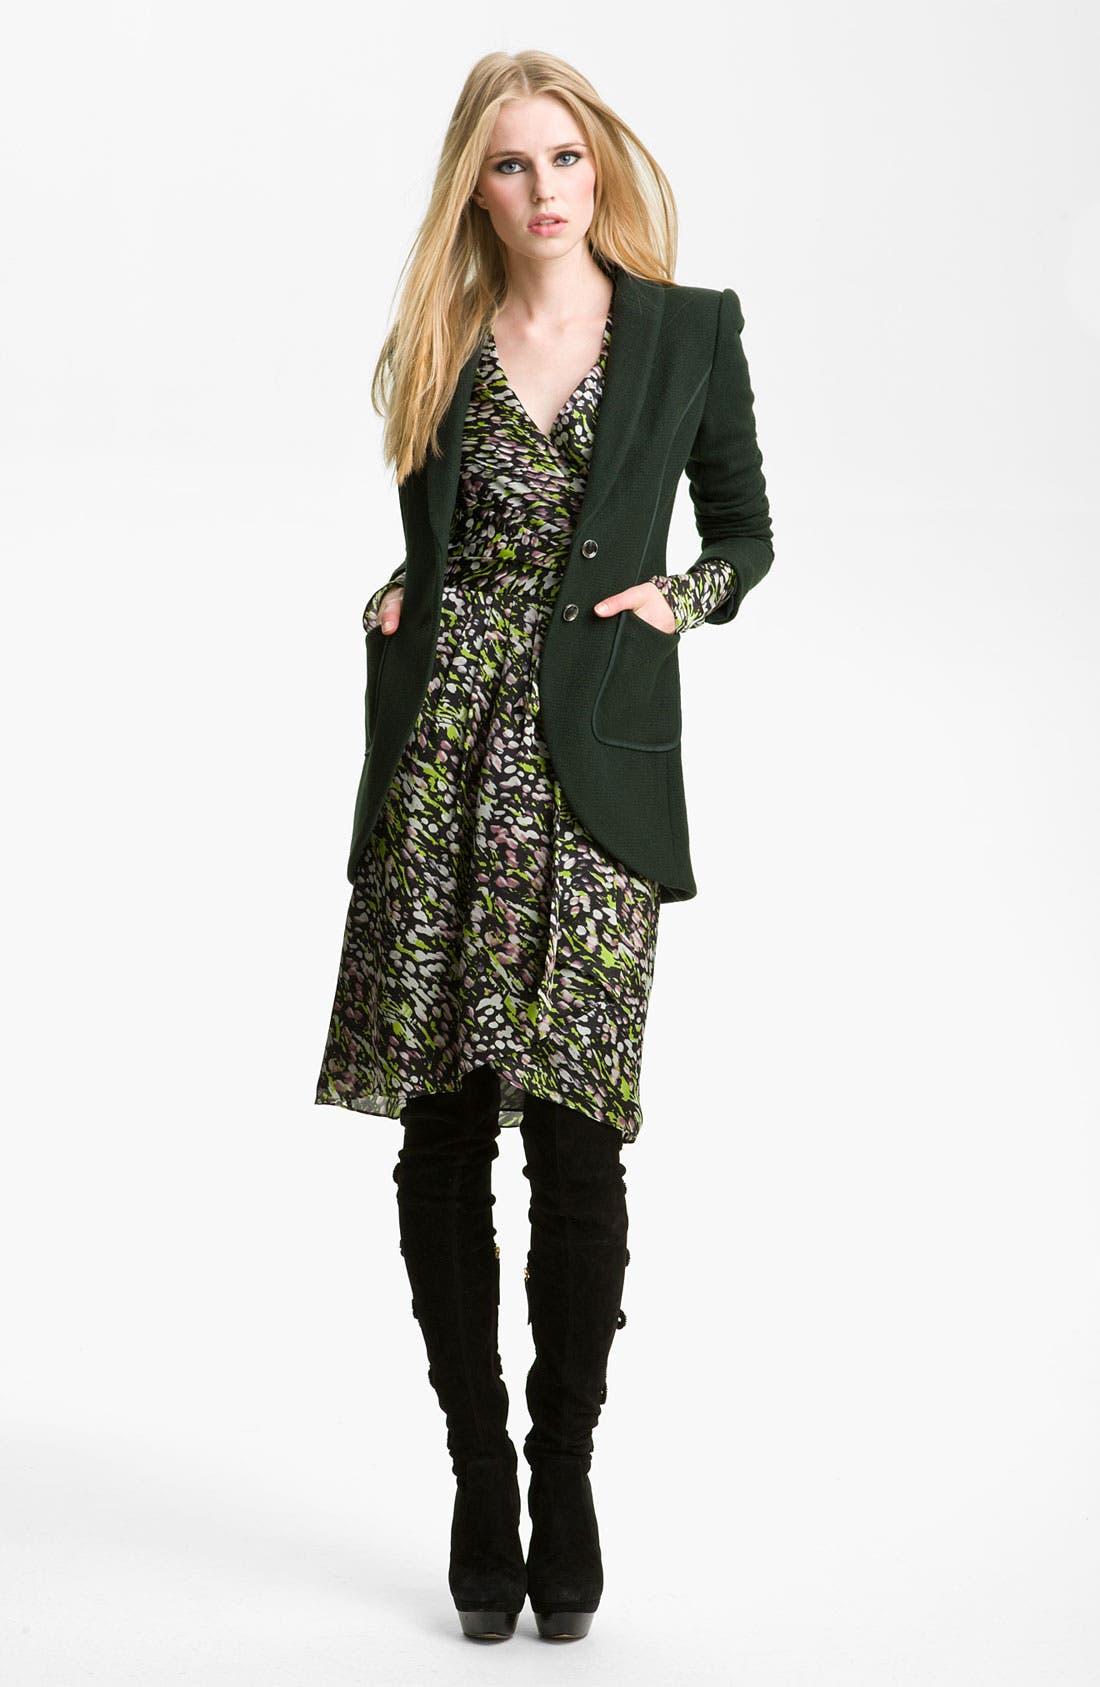 Alternate Image 1 Selected - Rachel Zoe 'Kenny' Cutaway Jacket